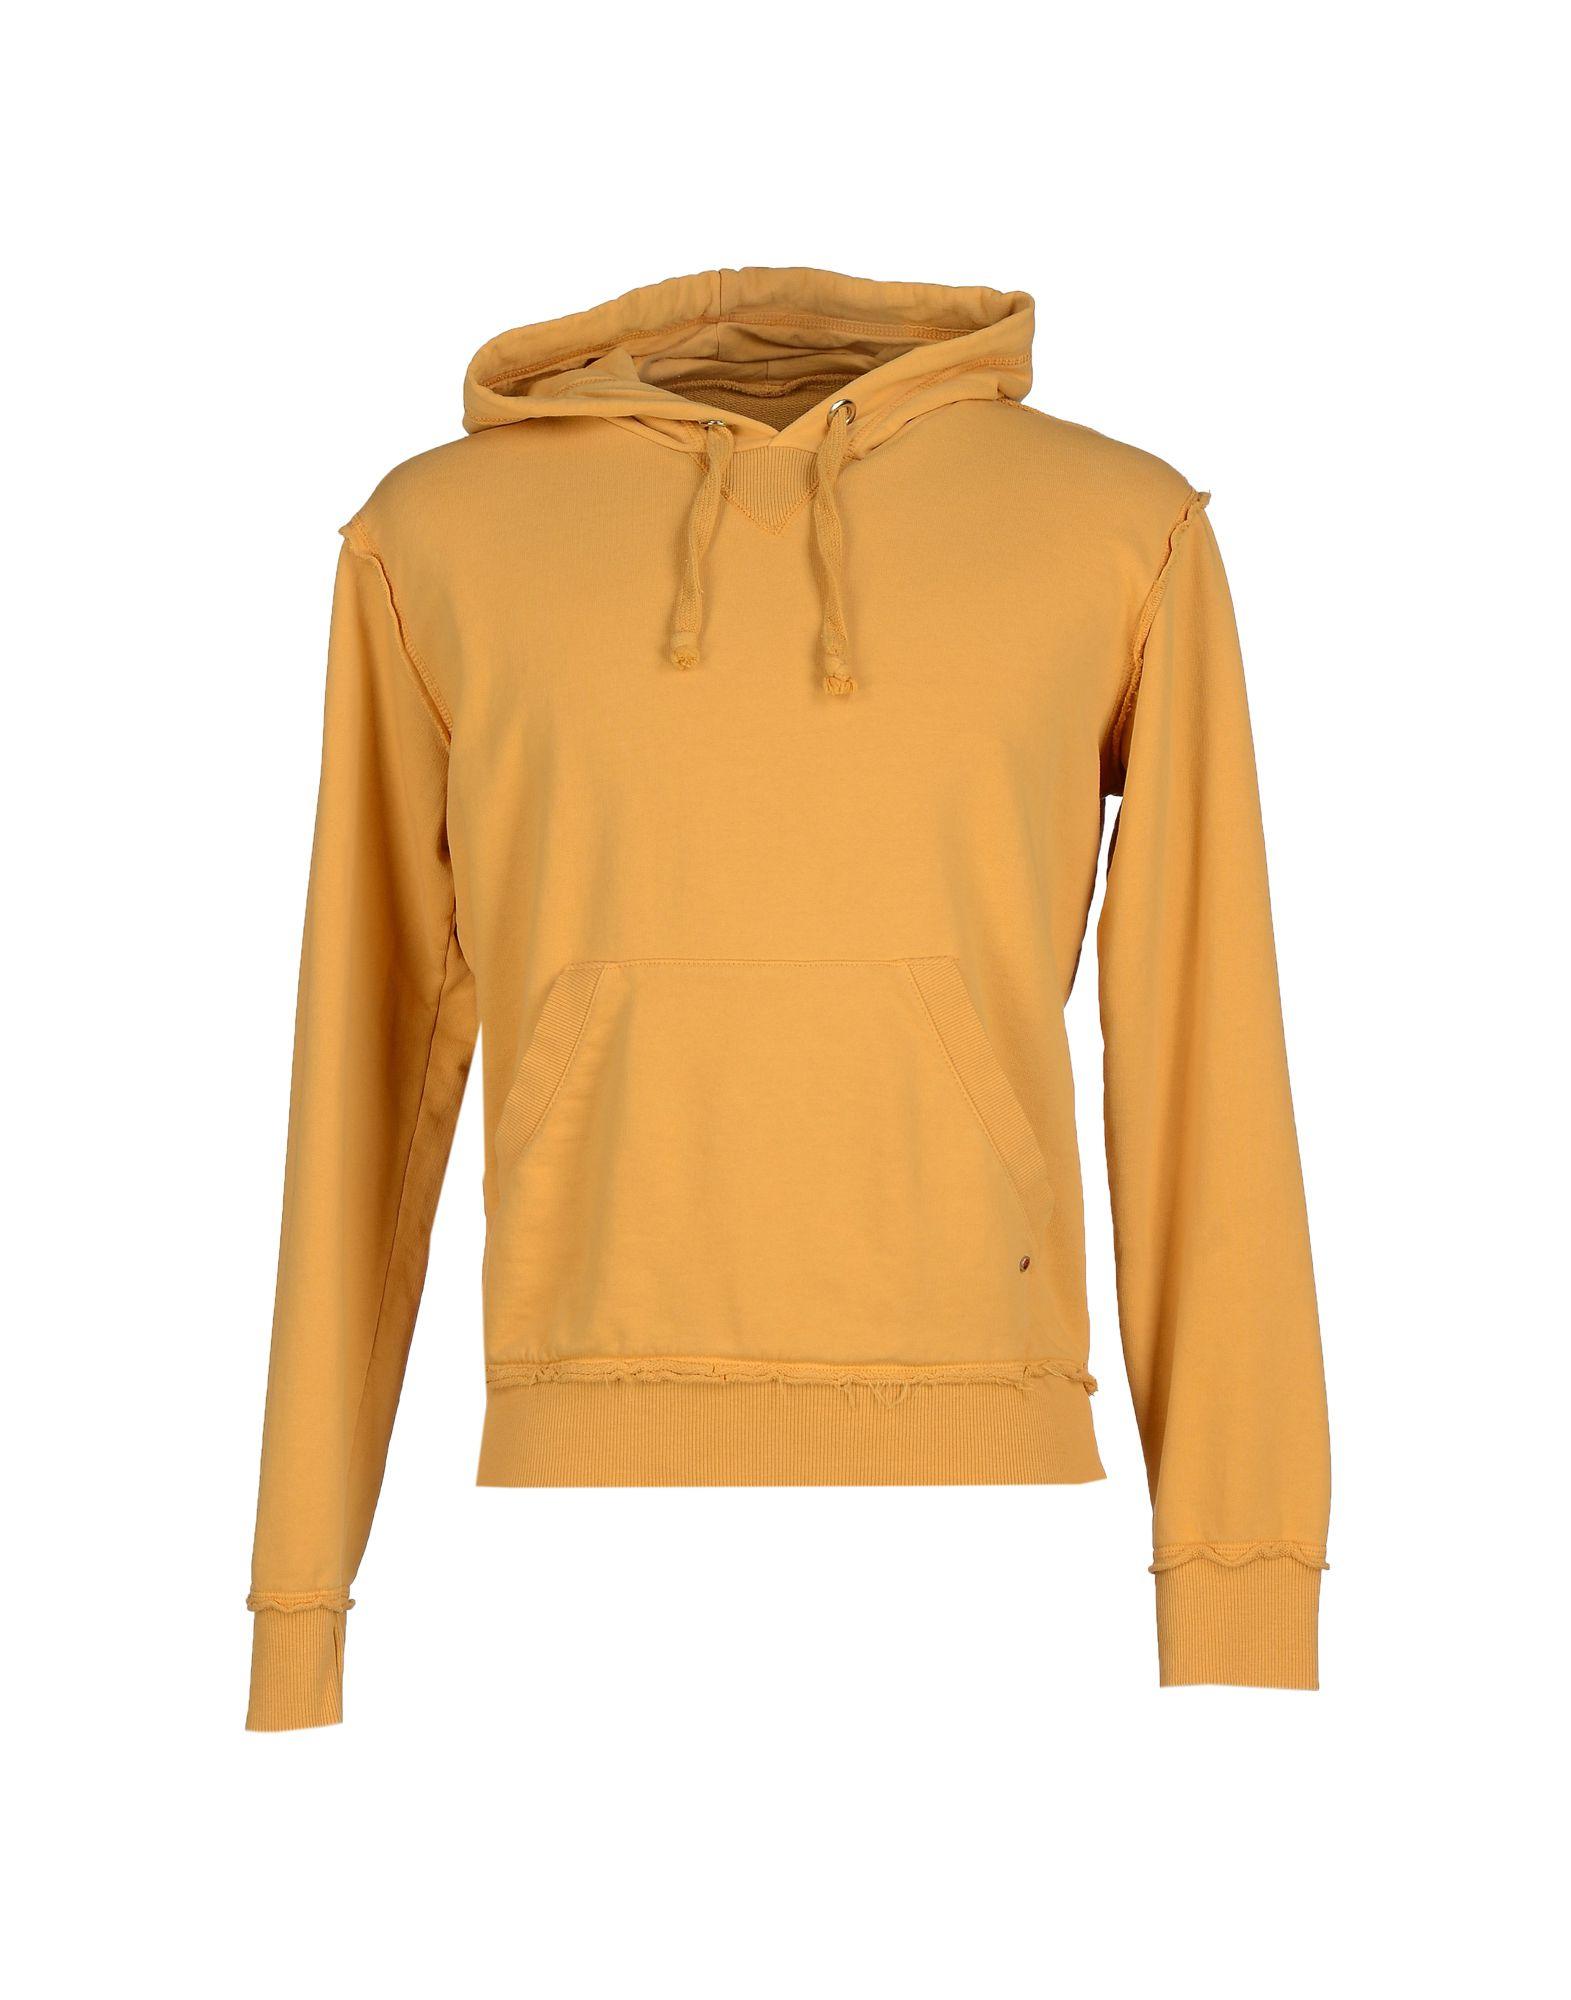 NO LAB Sweatshirts